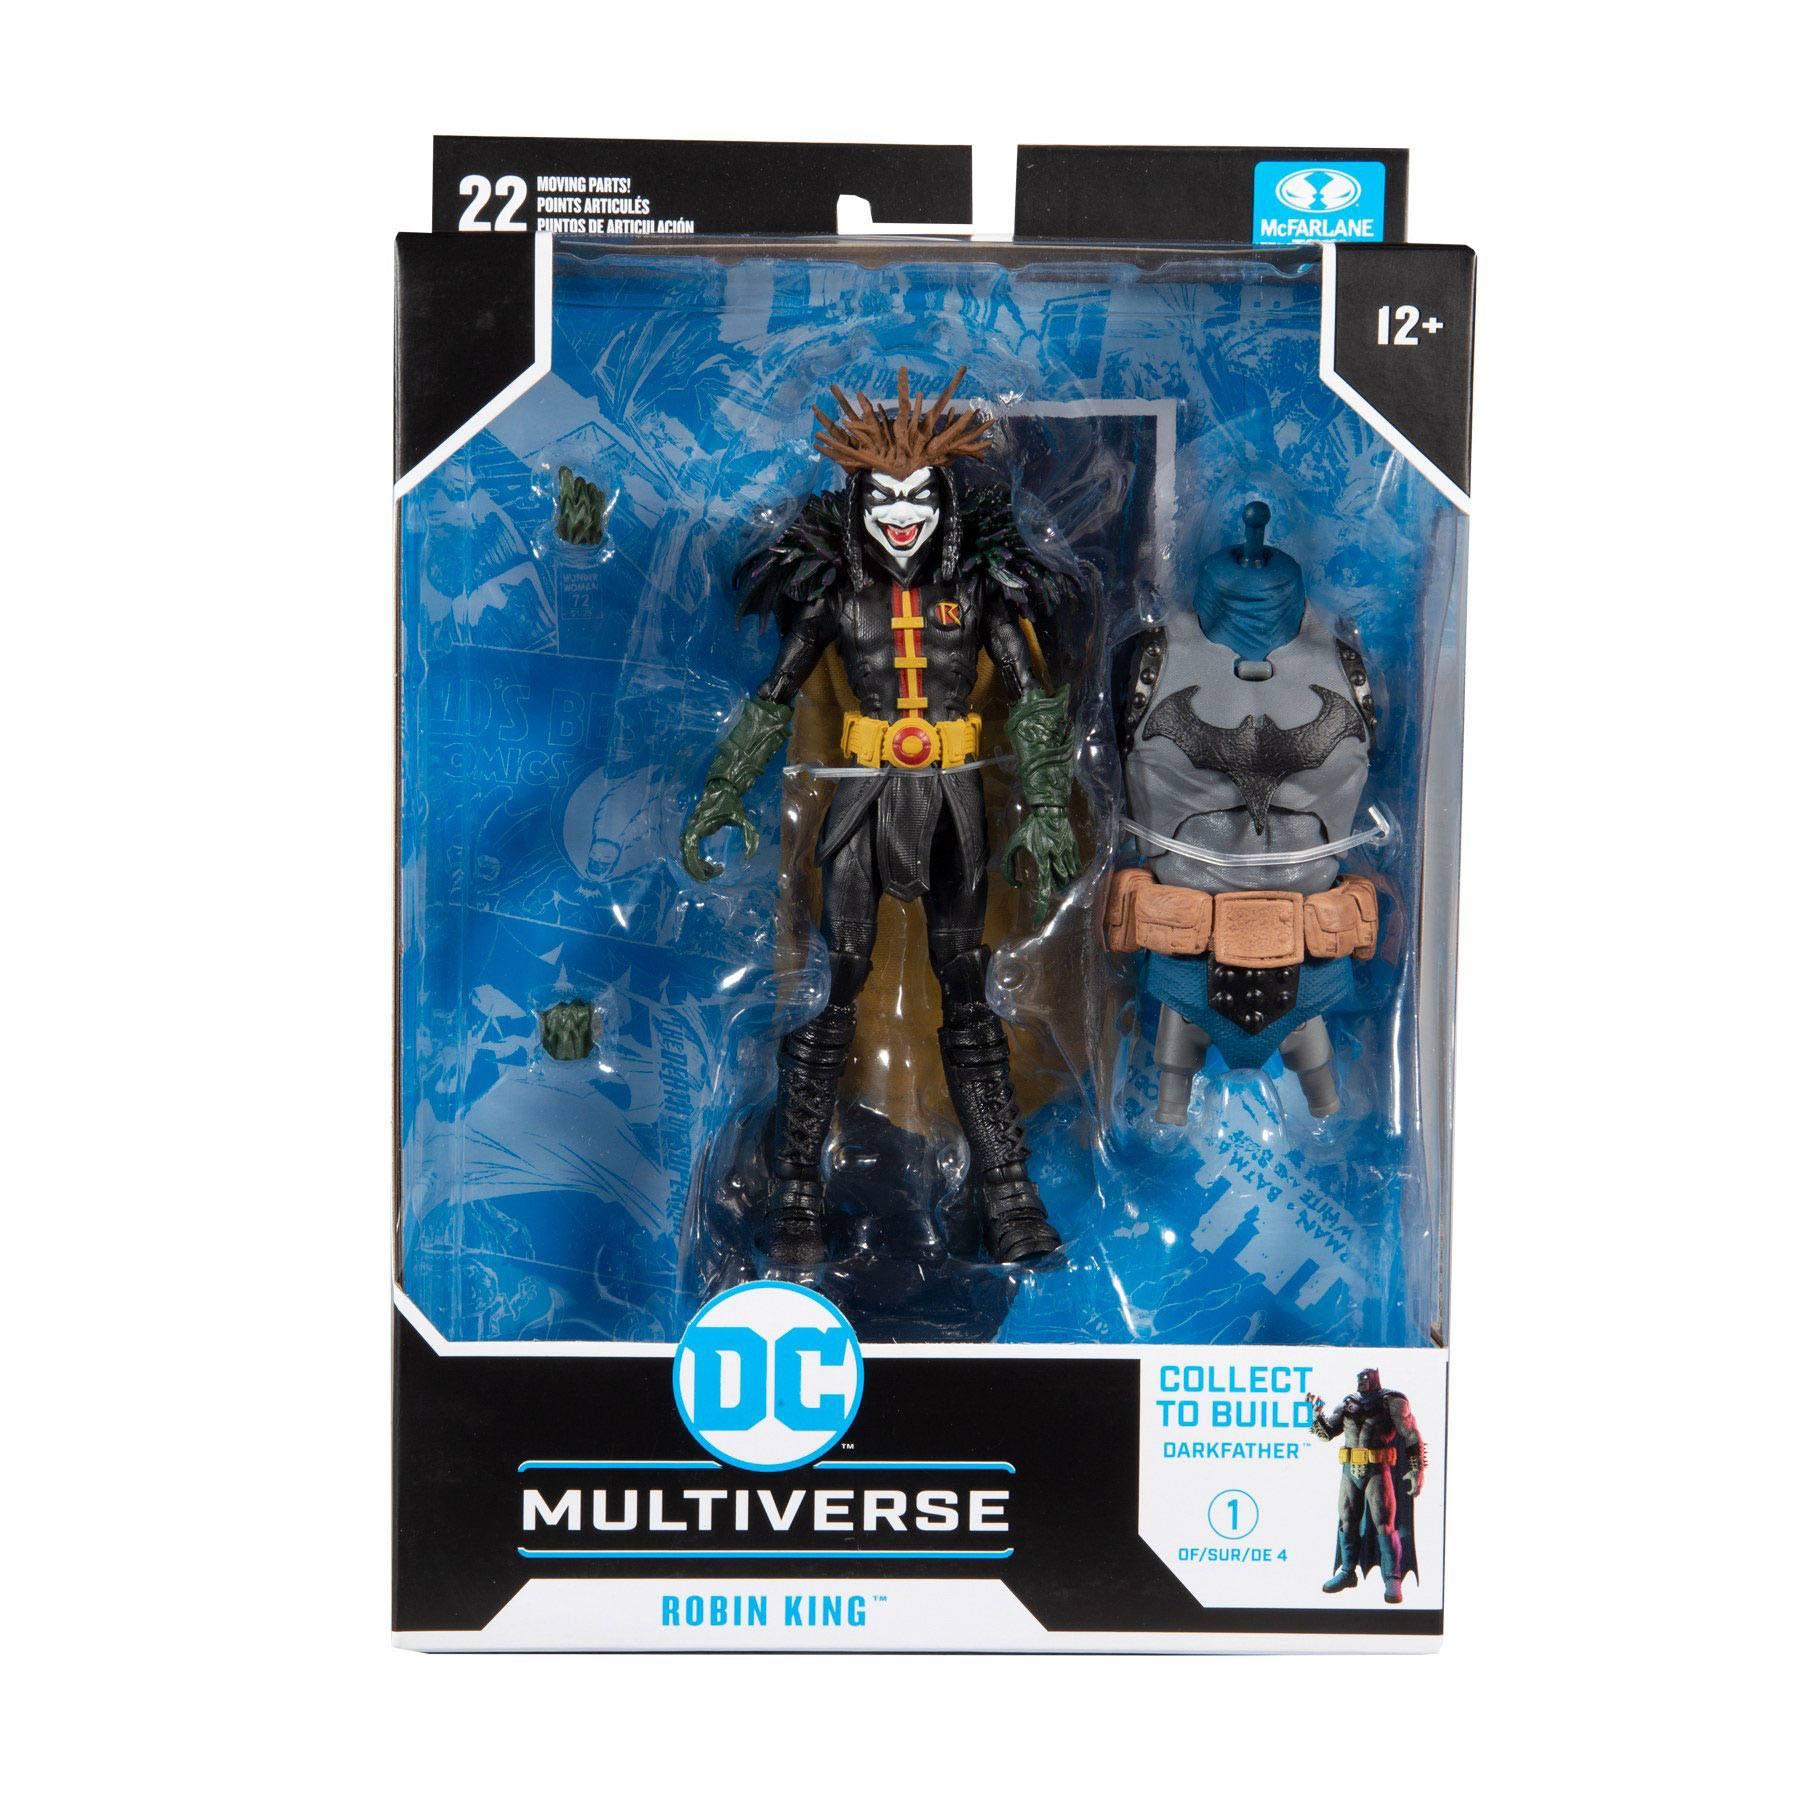 DC Multiverse Build A Actionfigur Robin King 18 cm MCF15419-1 787926154191